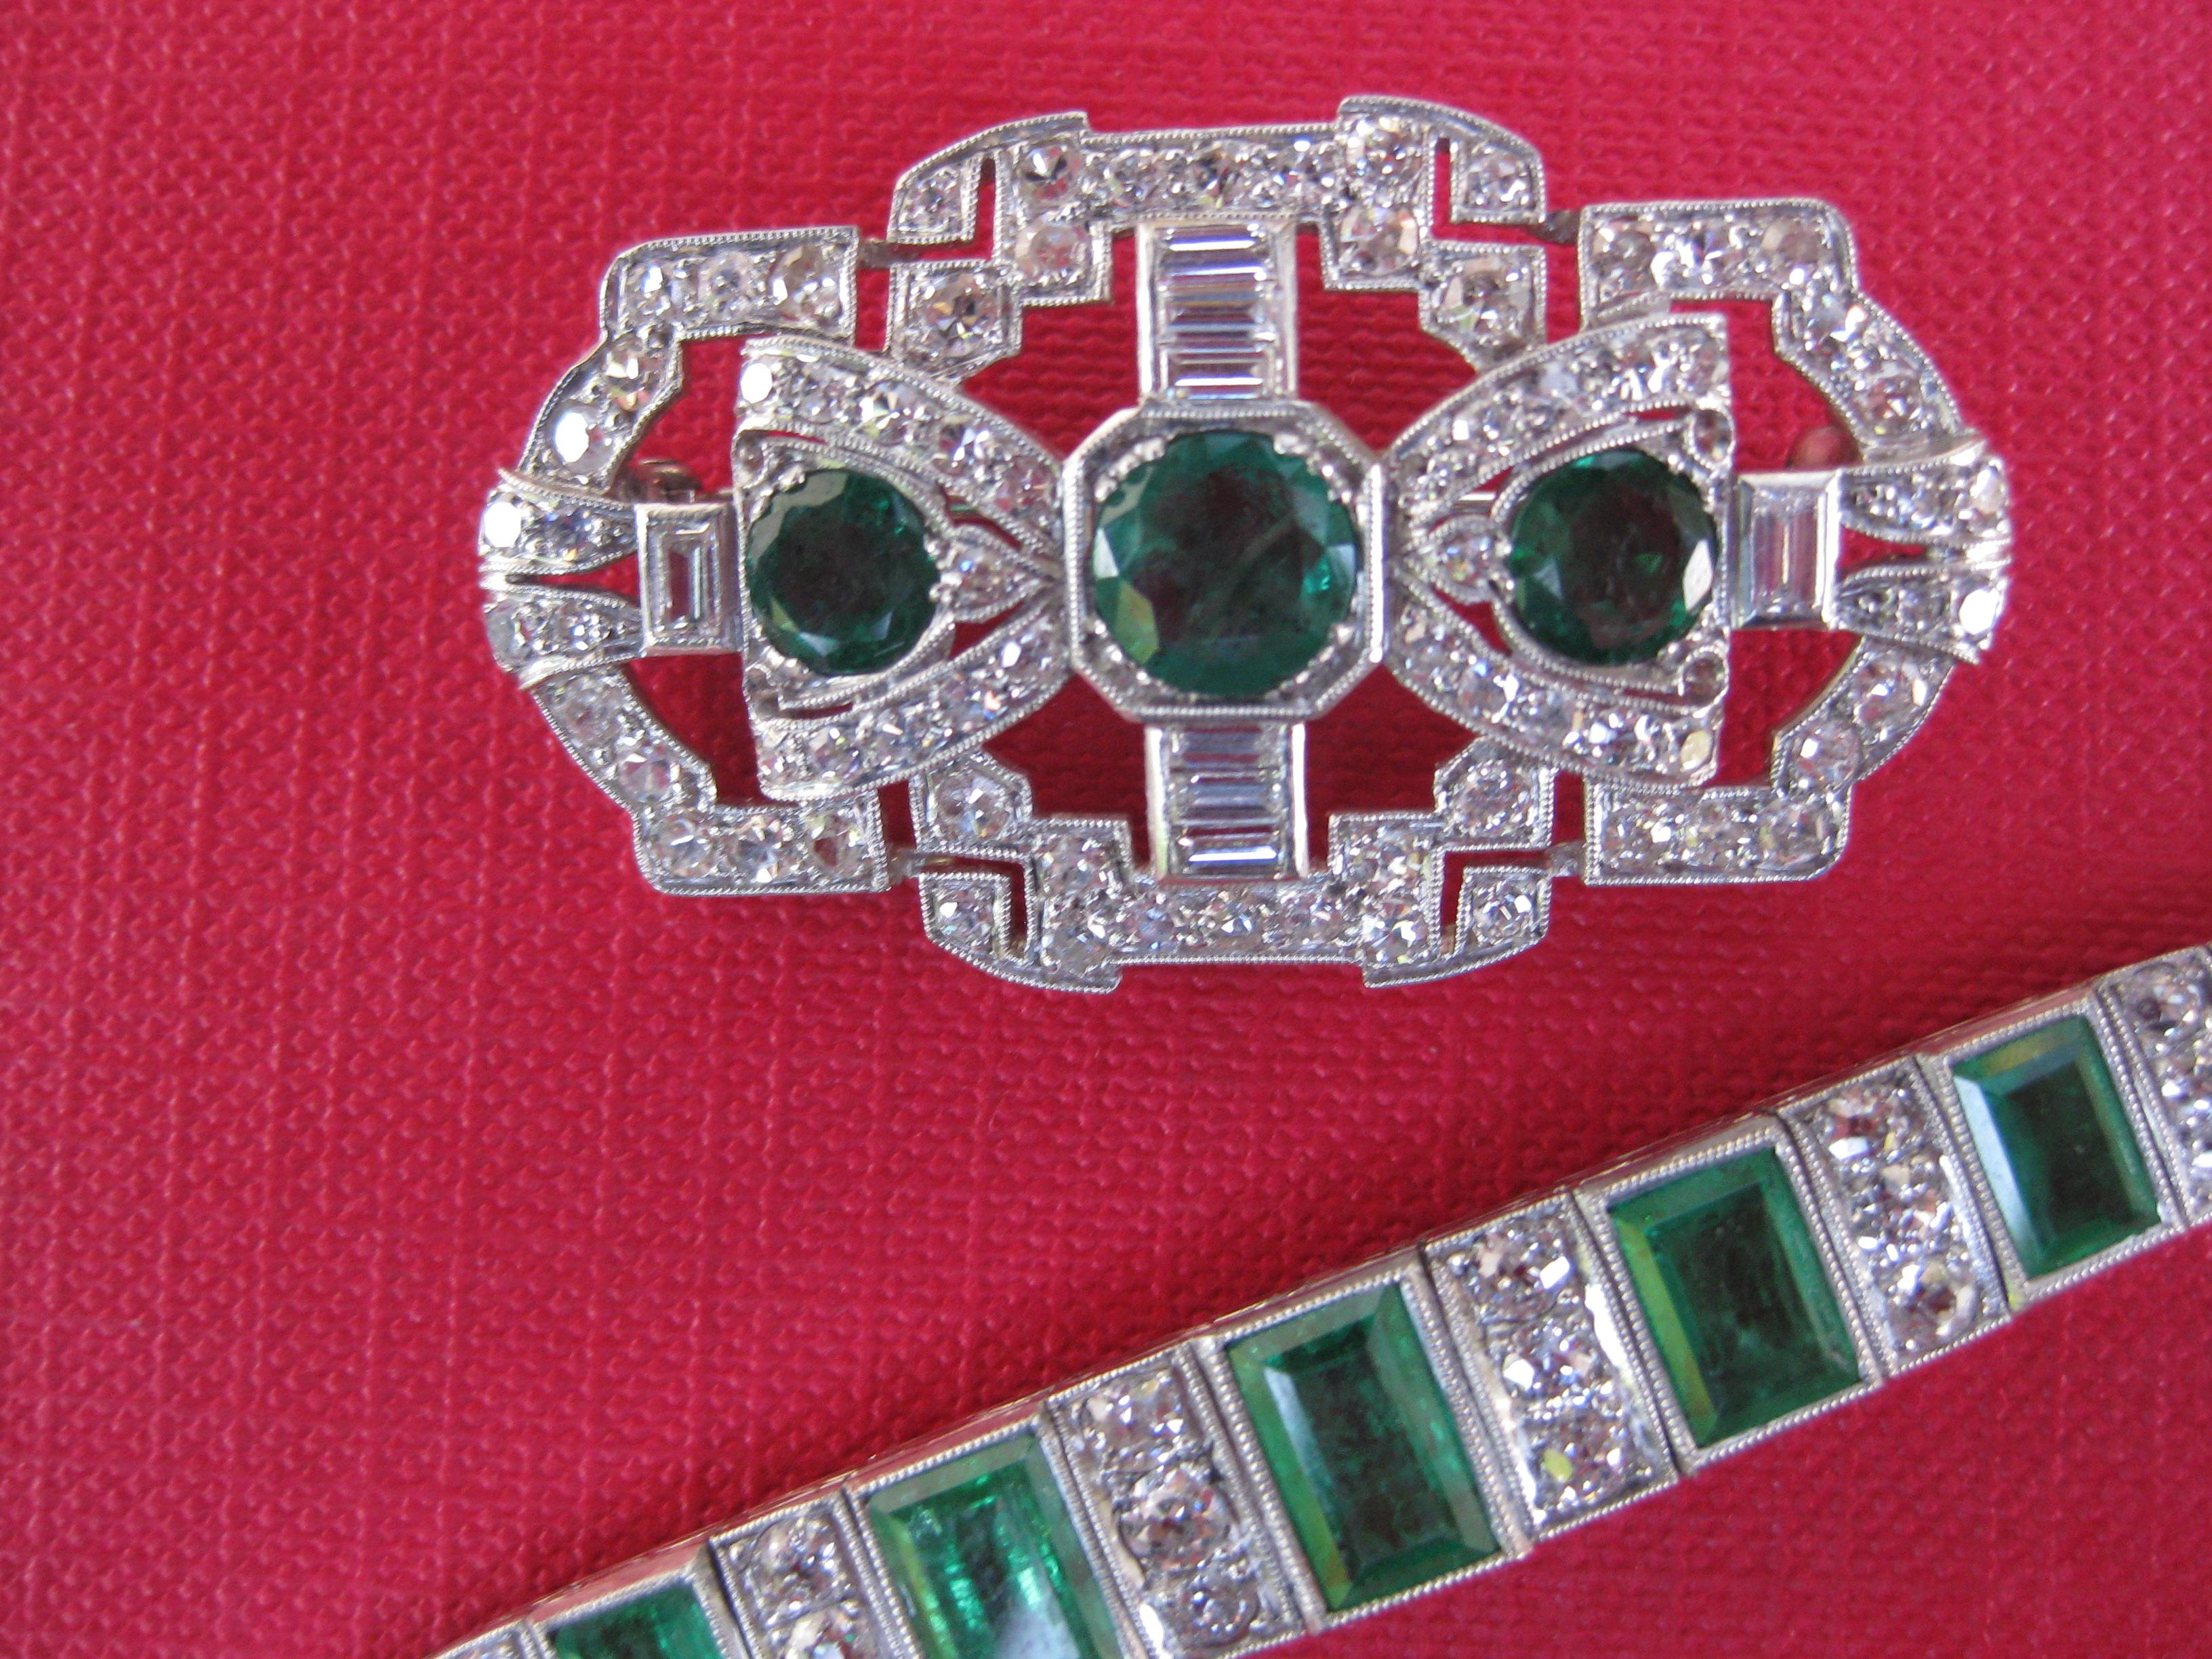 Art deco brosche armband linckersdorff for Art deco online shop